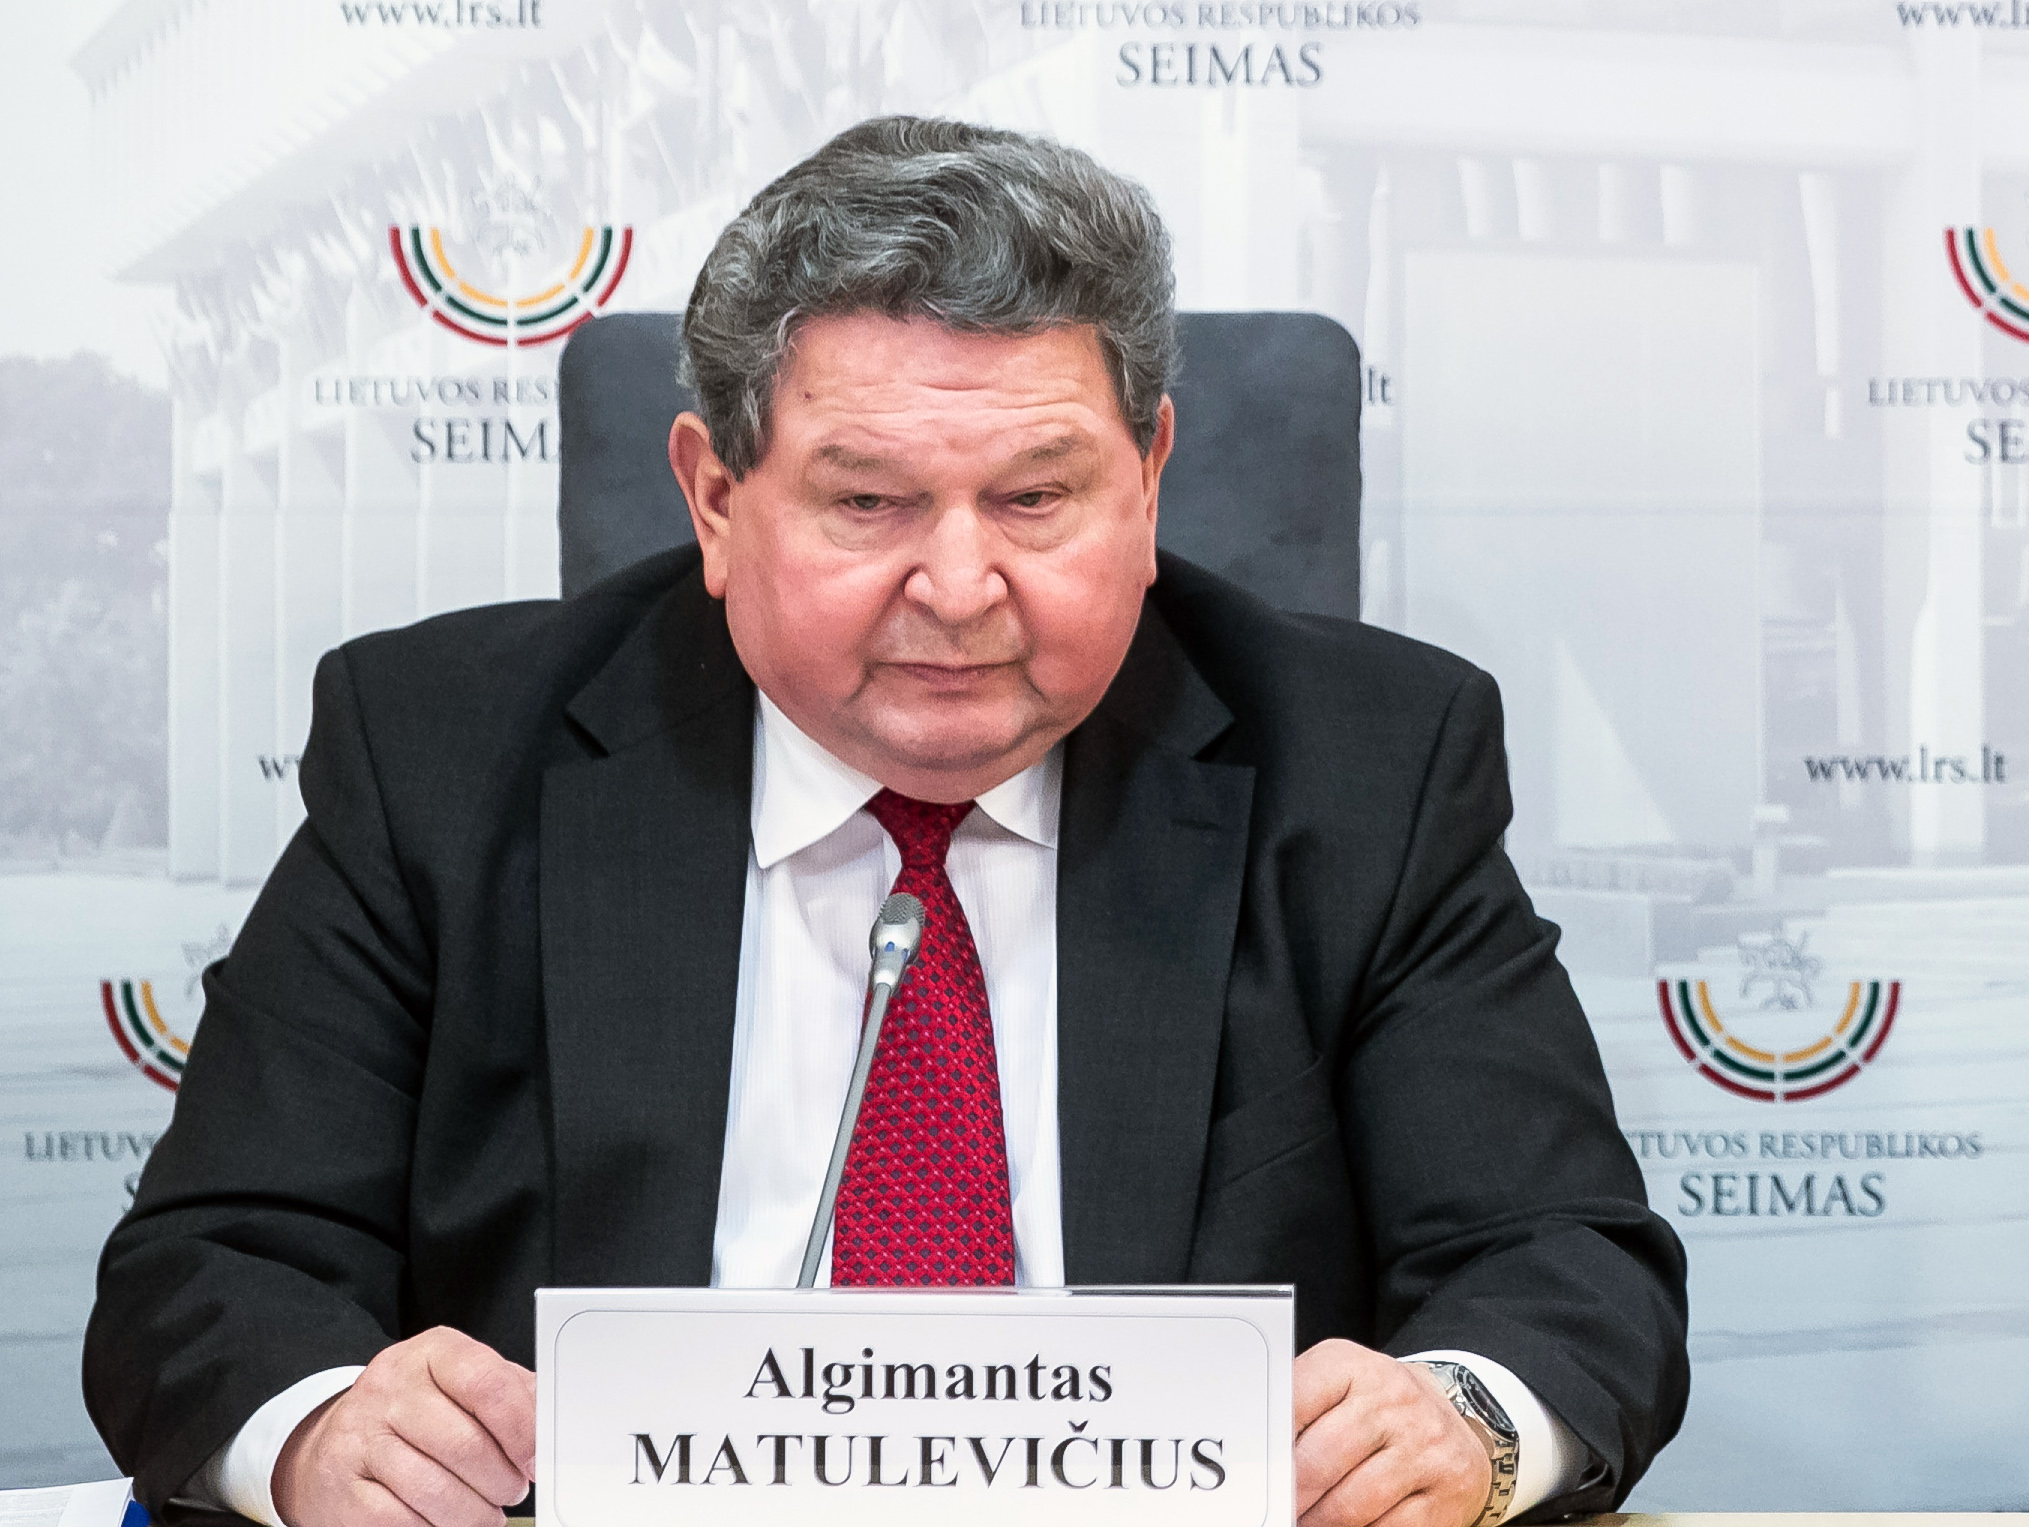 dr. Algimantas Matulevičius | lrs.lt, O. Posaškovos nuotr.